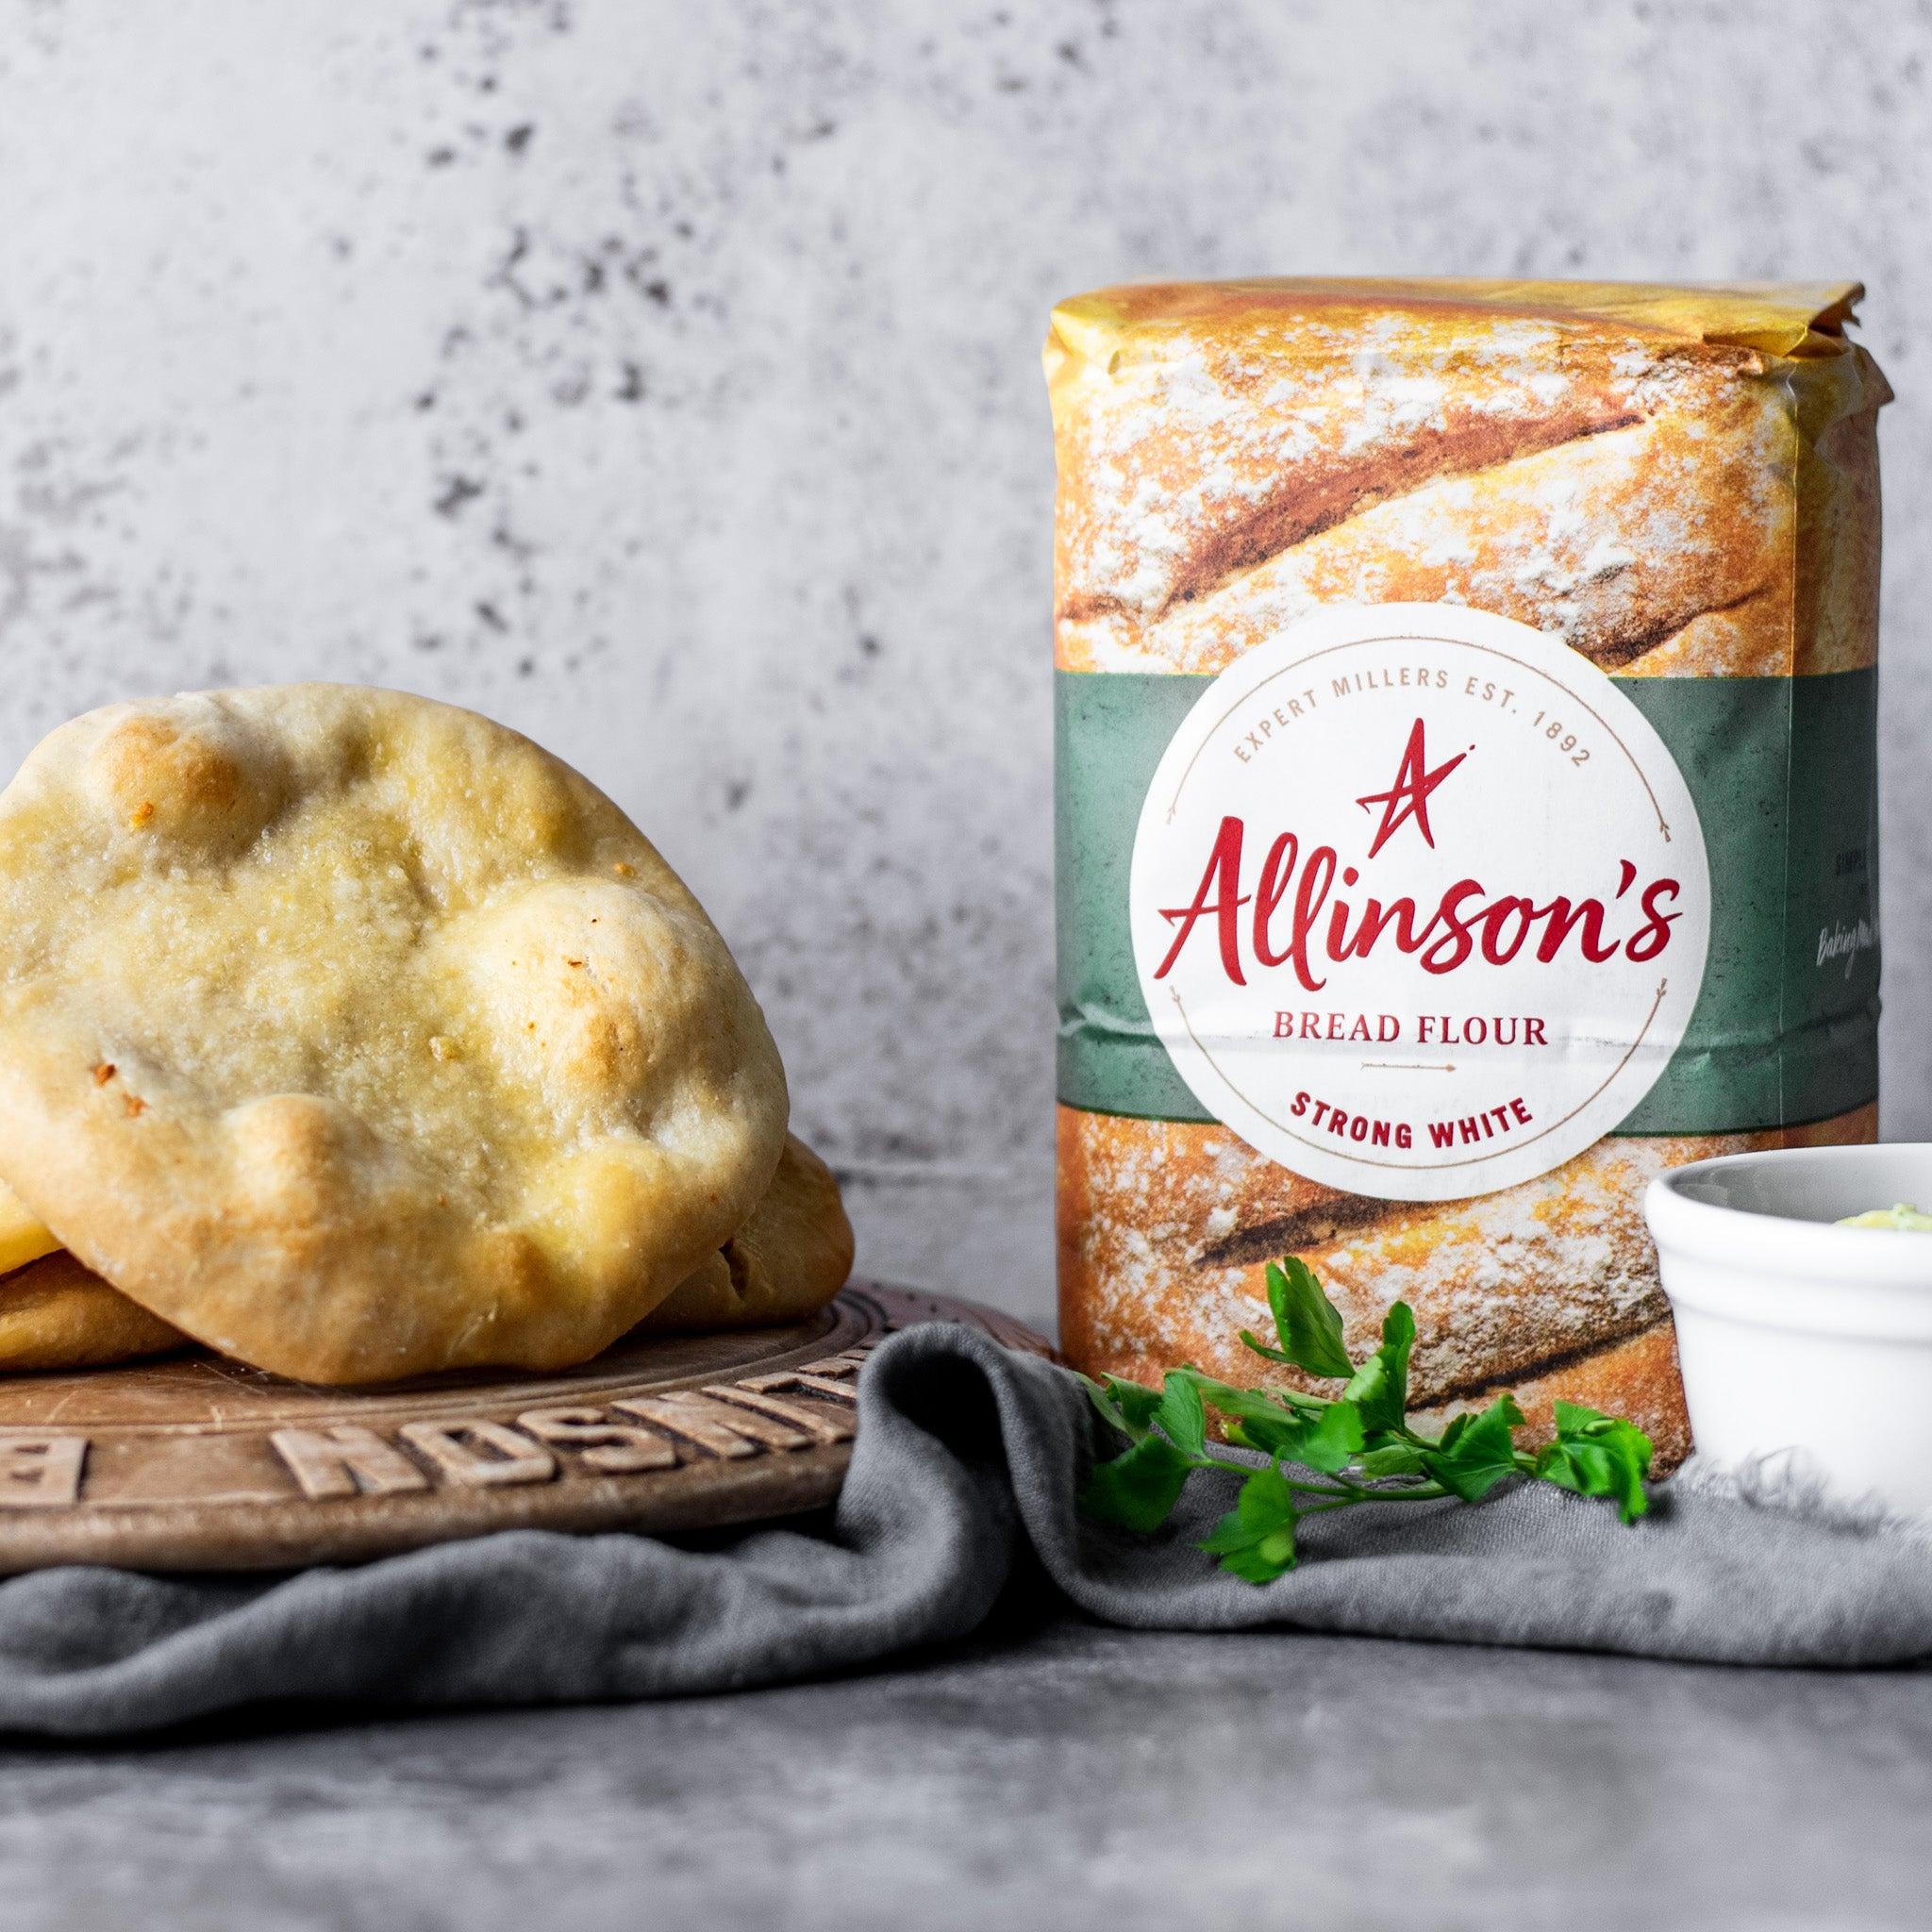 Allinsons-Garlic-Pizza-1-1-Baking-Mad-1.jpg